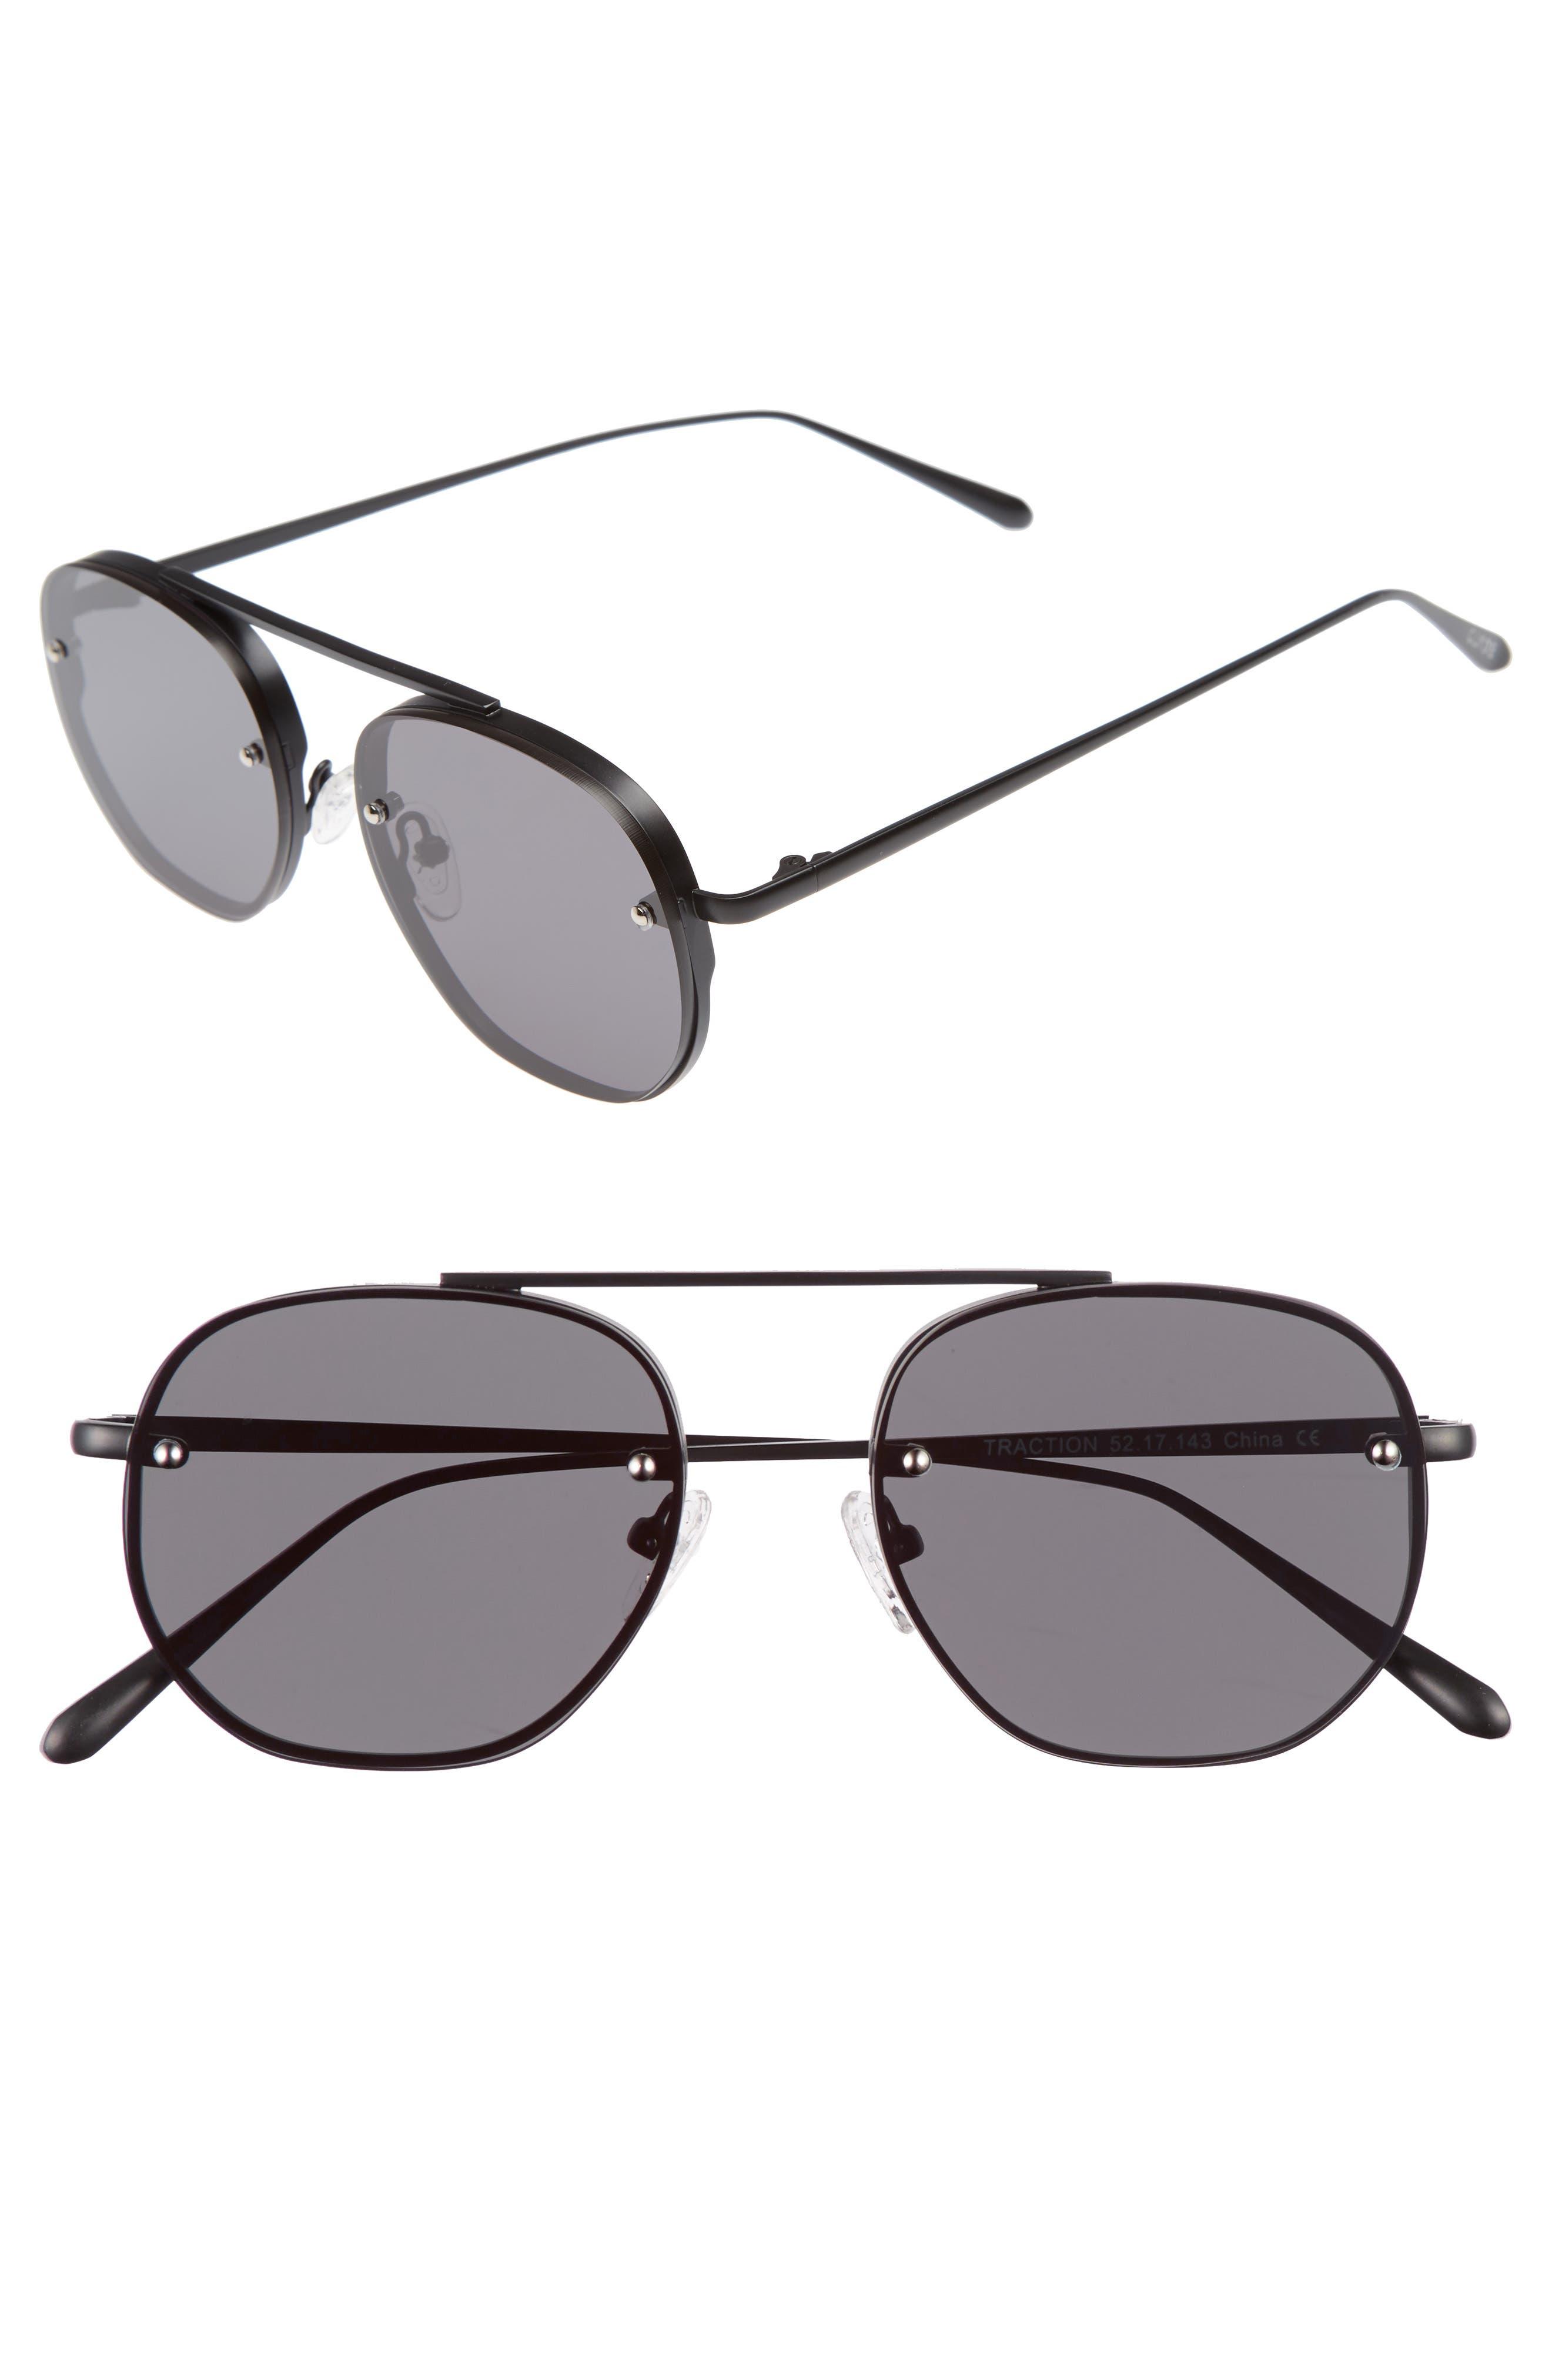 Traction 52mm Aviator Sunglasses,                         Main,                         color, Gravity Black